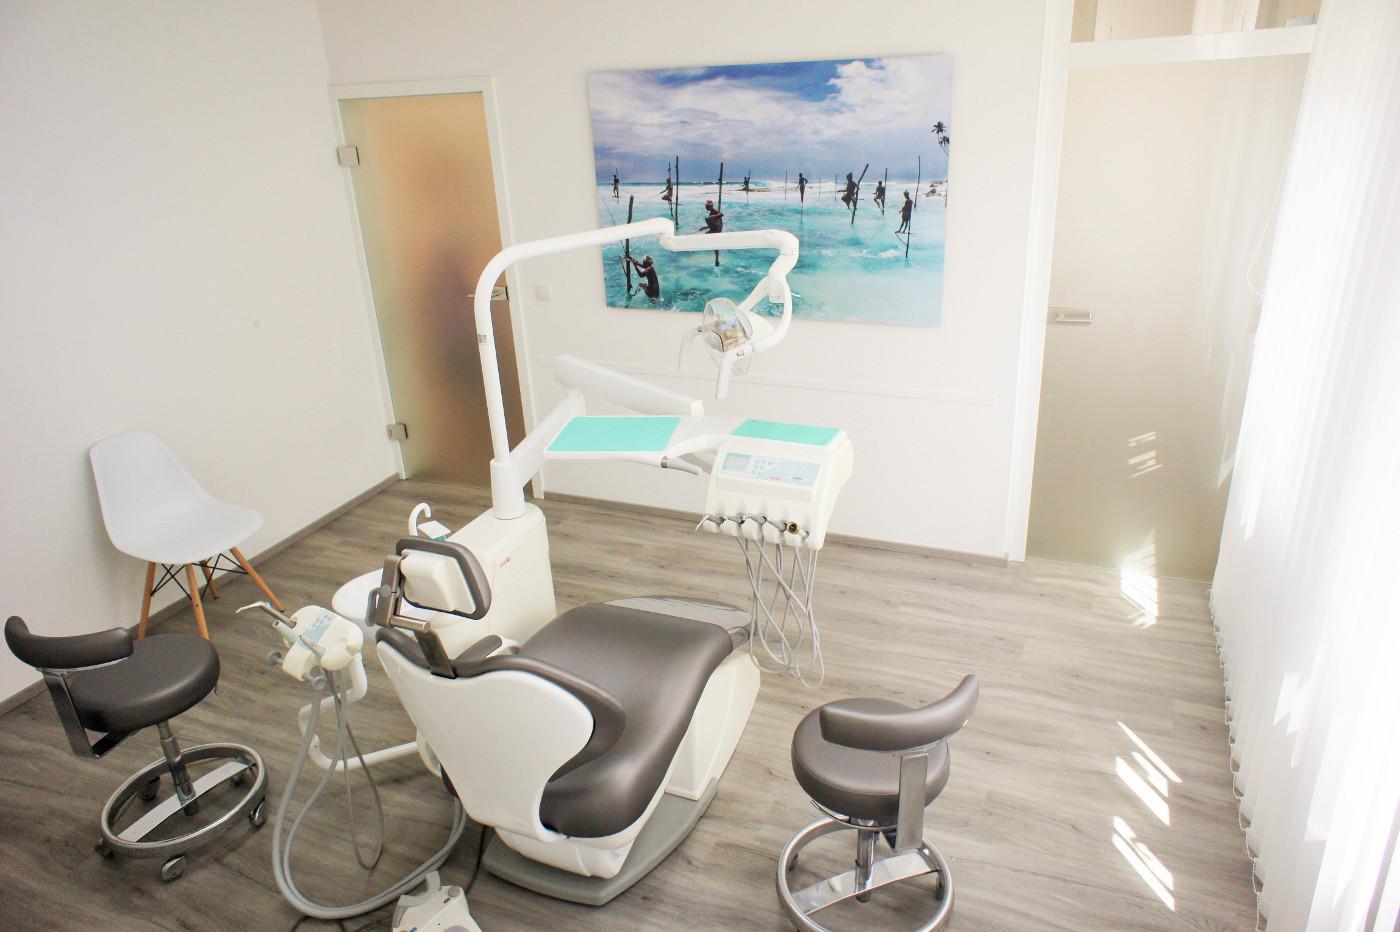 Behandlungszimmer 2 Zahnarzt Lauf Mareike Pietsch